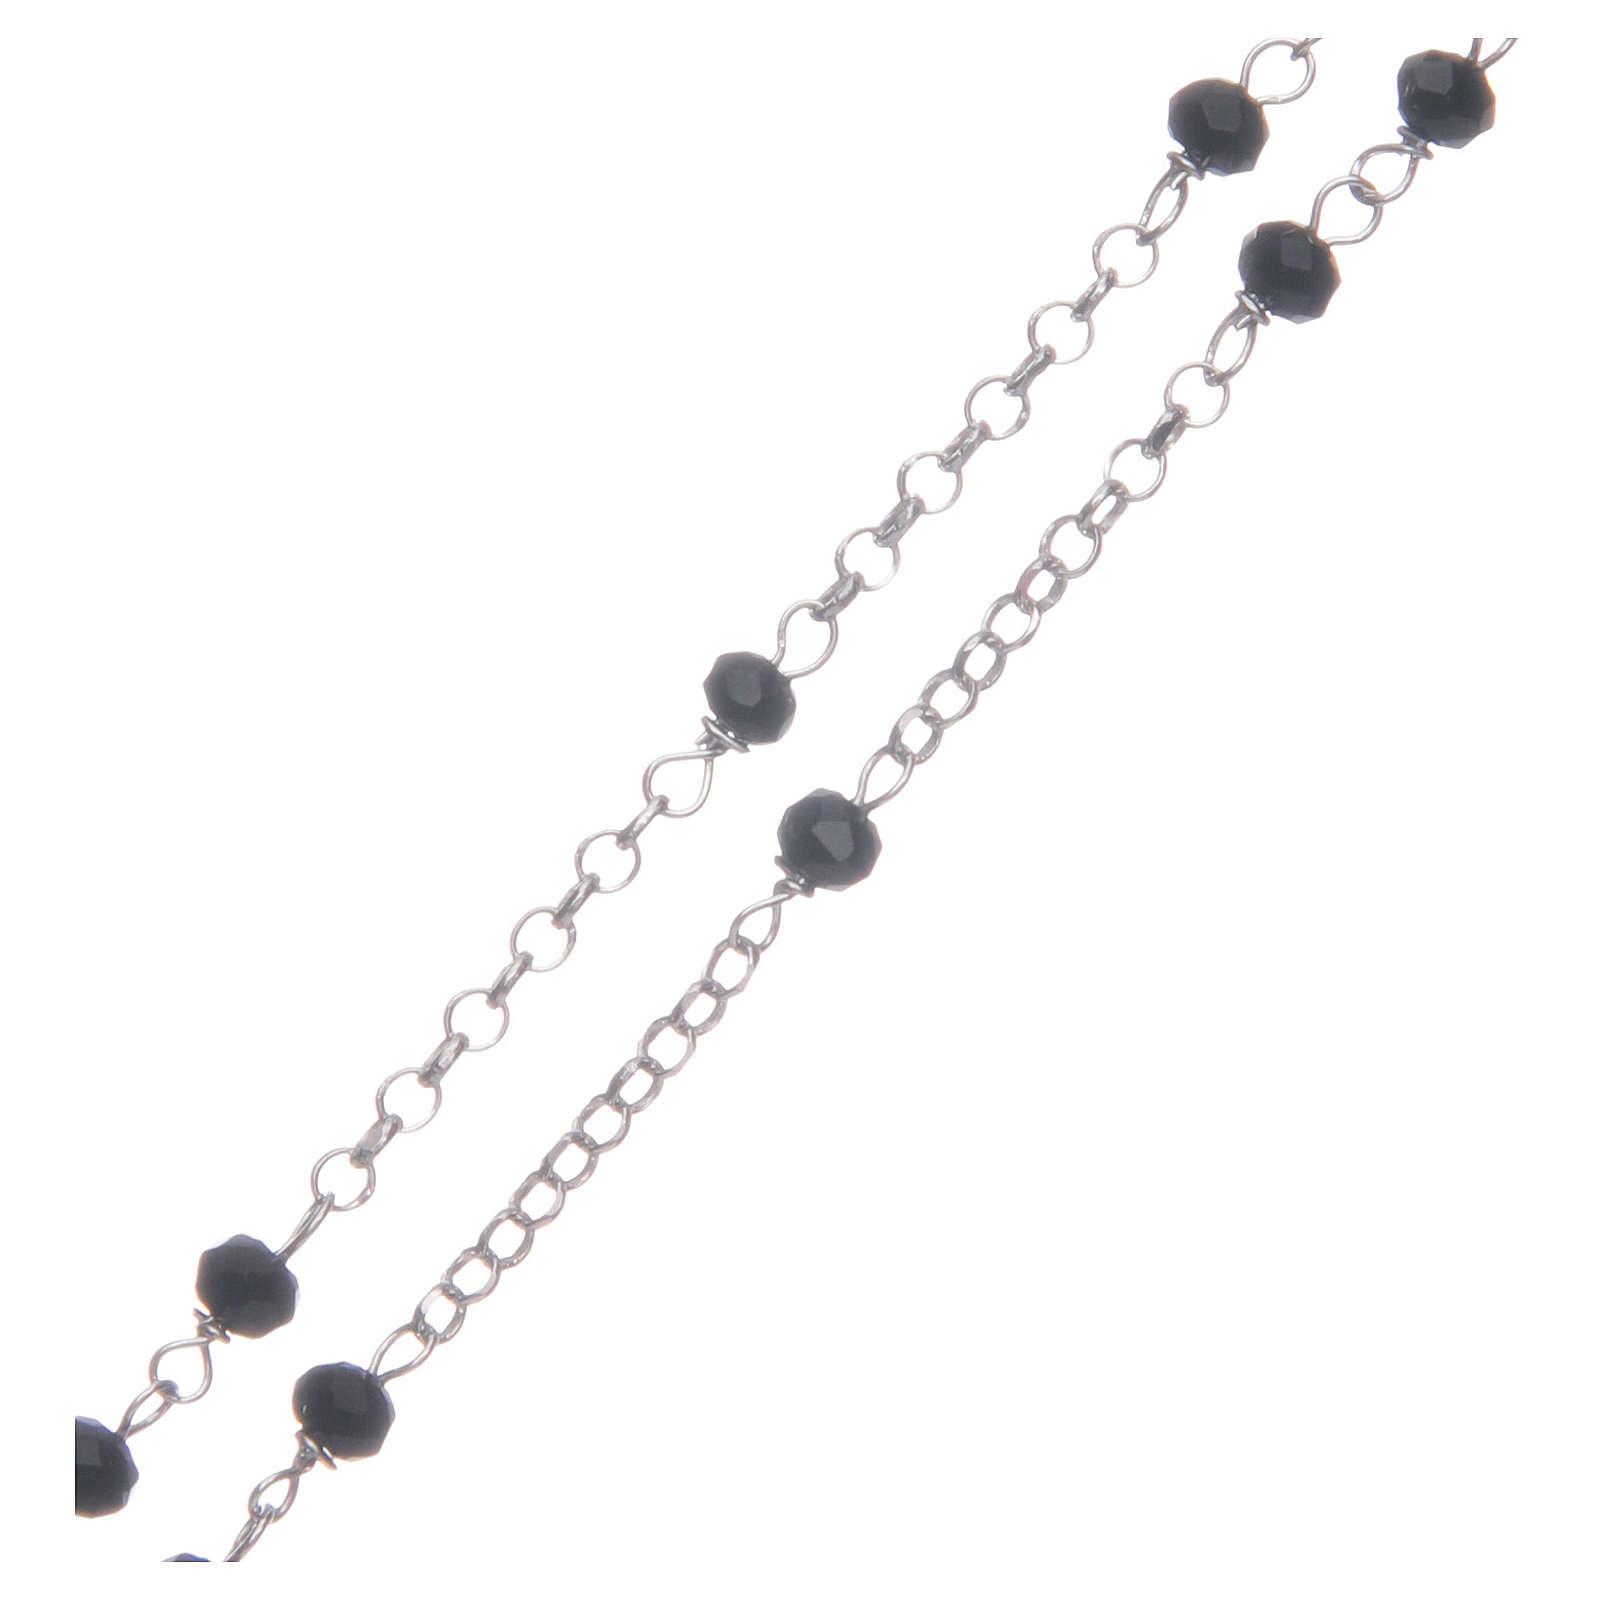 Rosario classico girocollo Santa Rita nero argento 925 4